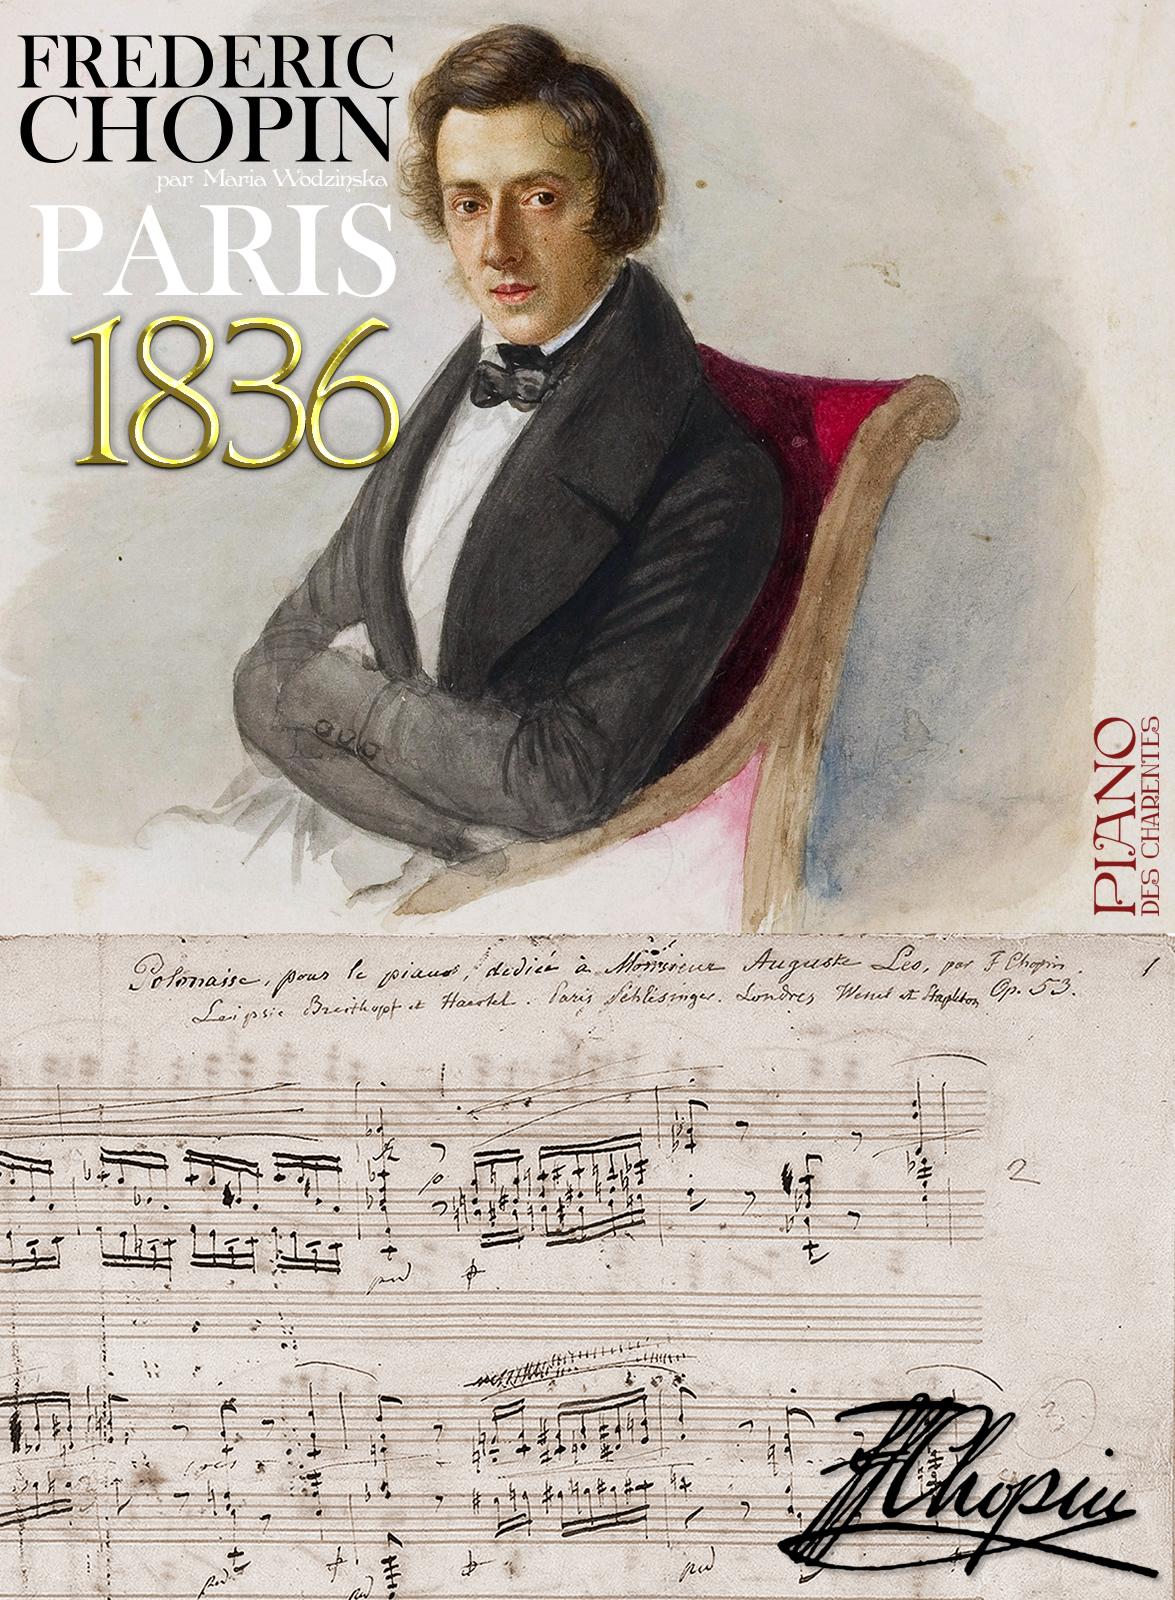 Frédéric Chopin 1836 - Piano des Charentes